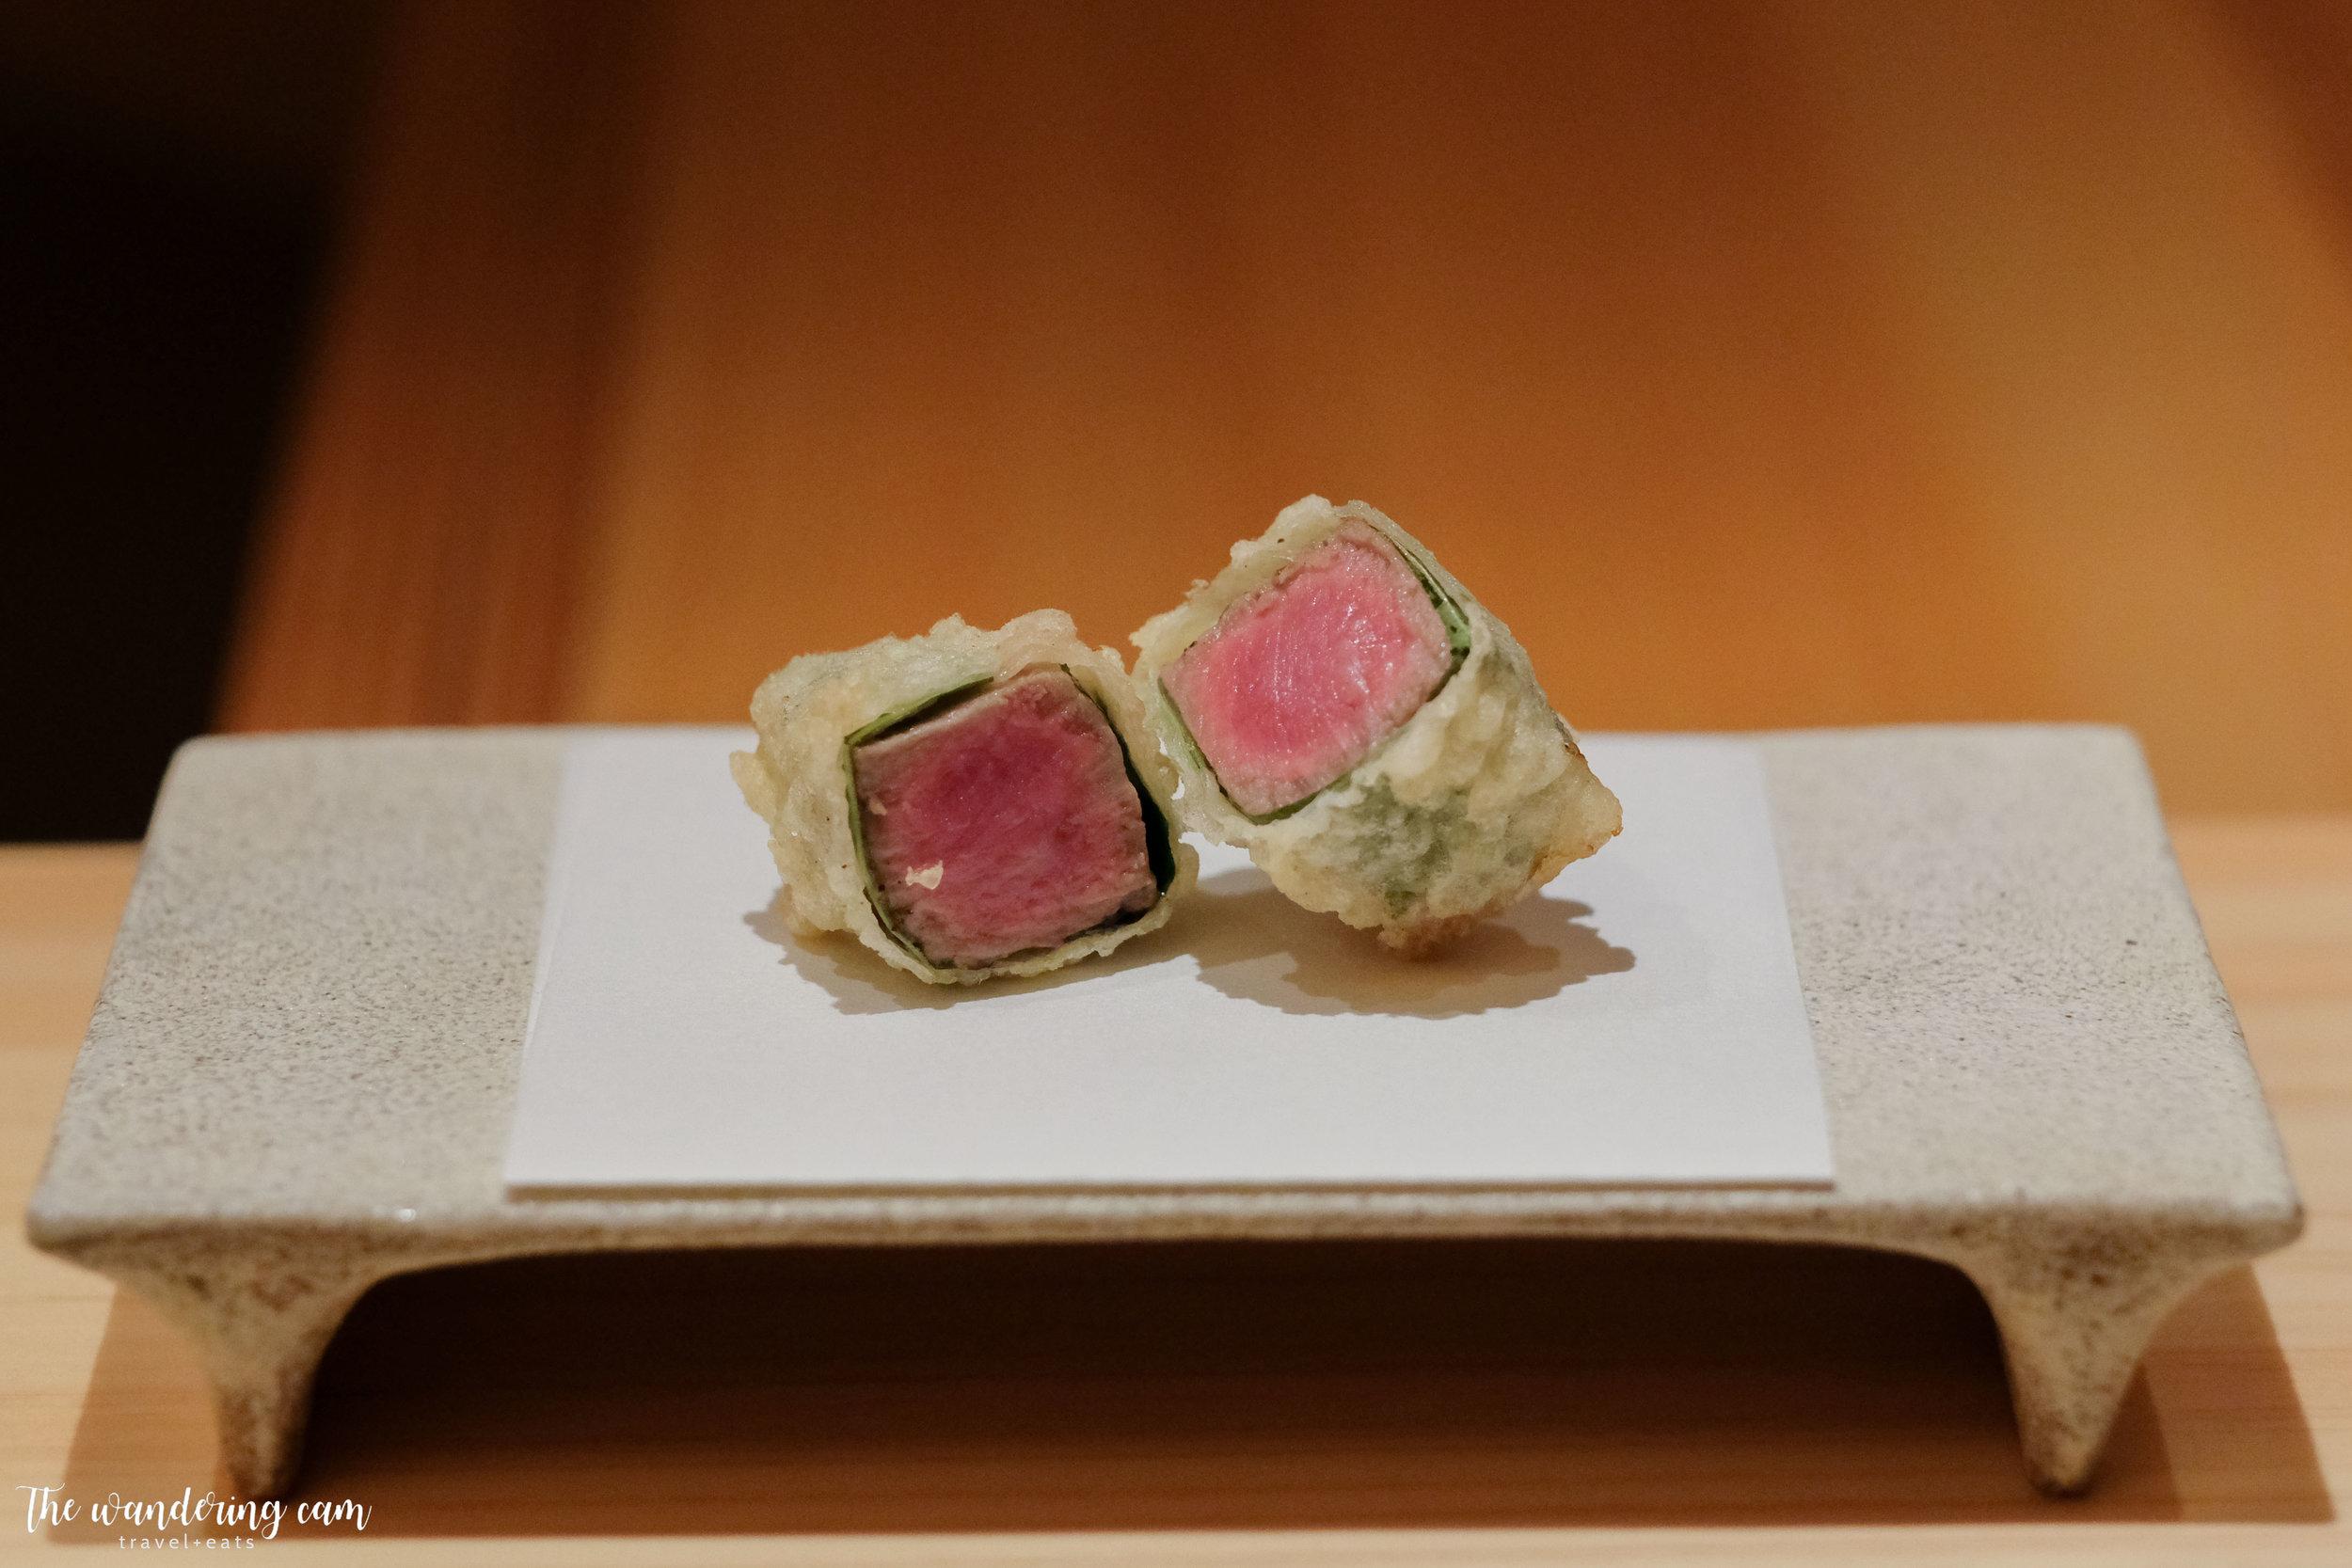 Tempura of Kagoshima wagyu wrapped in shiso leaf - paired with white truffle salt